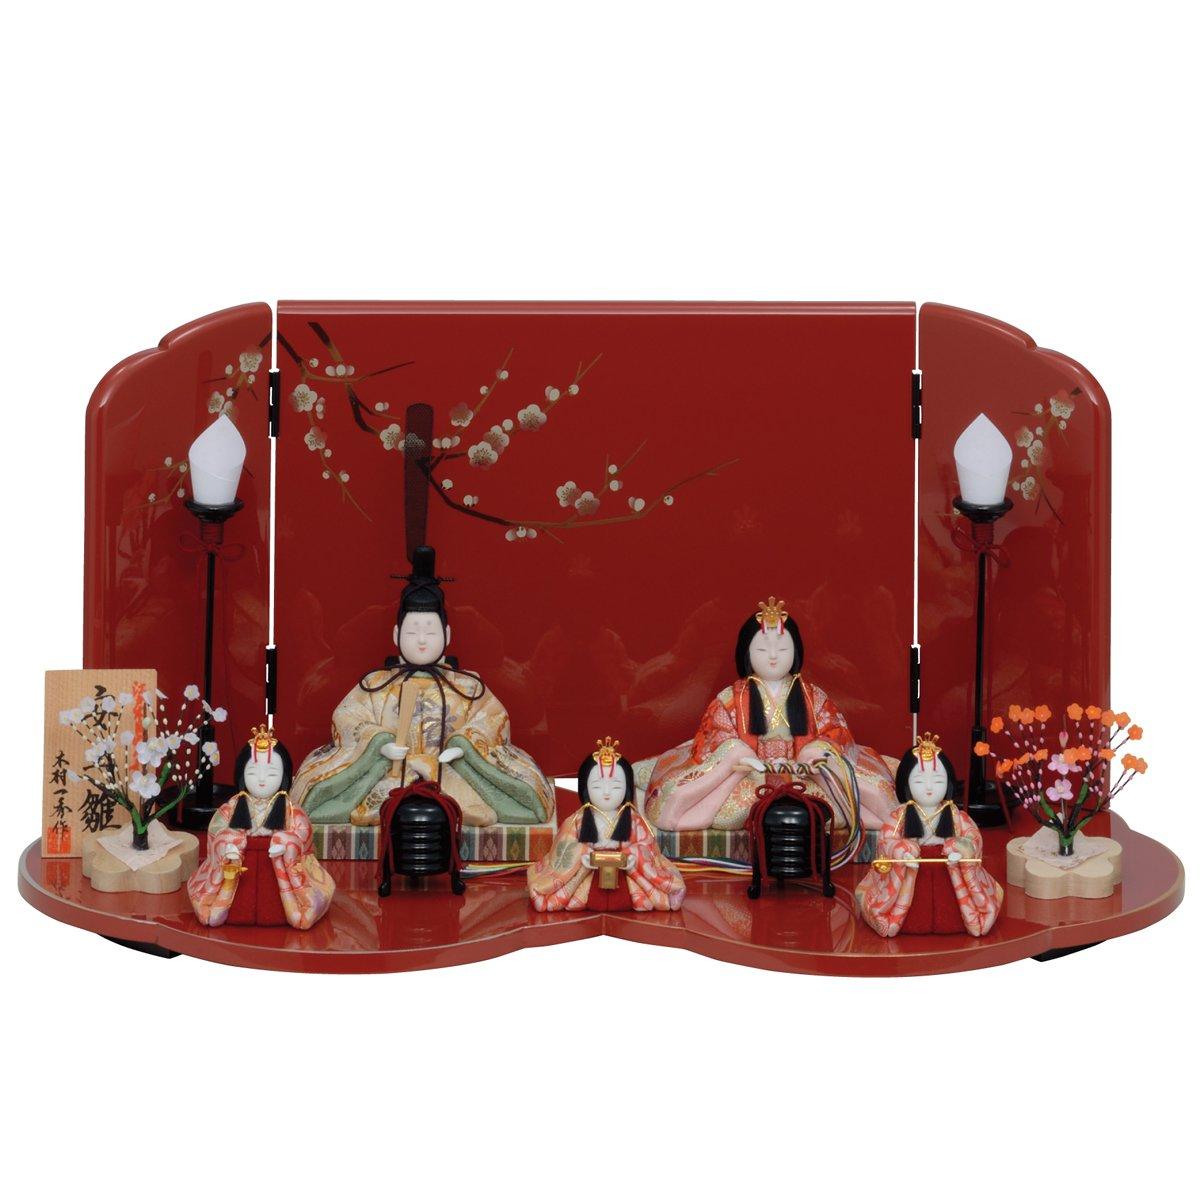 人形工房天祥 雛人形 2018年 一秀 木目込み人形 五人飾り 平飾り 安土雛160号   B078MQ99N1